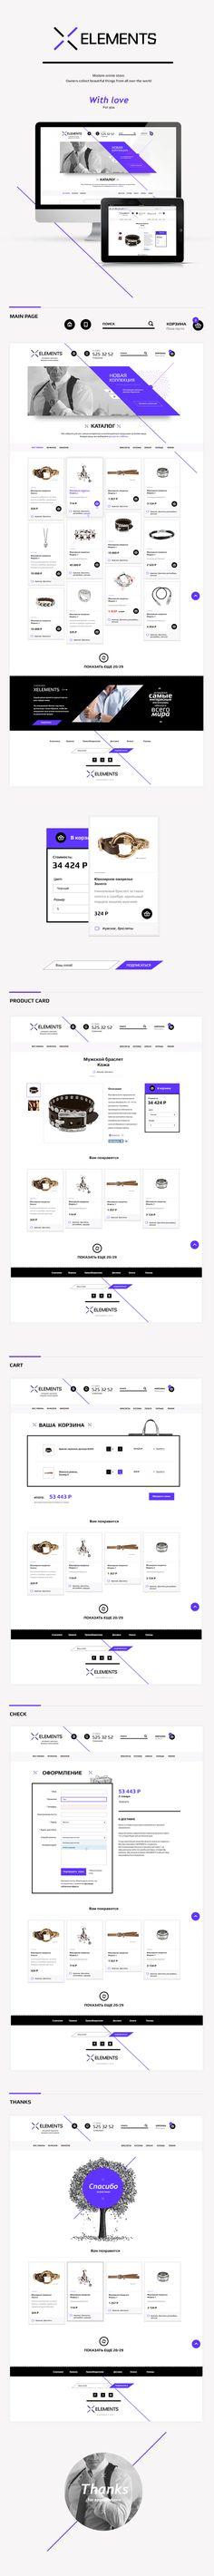 XELEMENS - modern store by Ann Tereschenko, via Behance #y